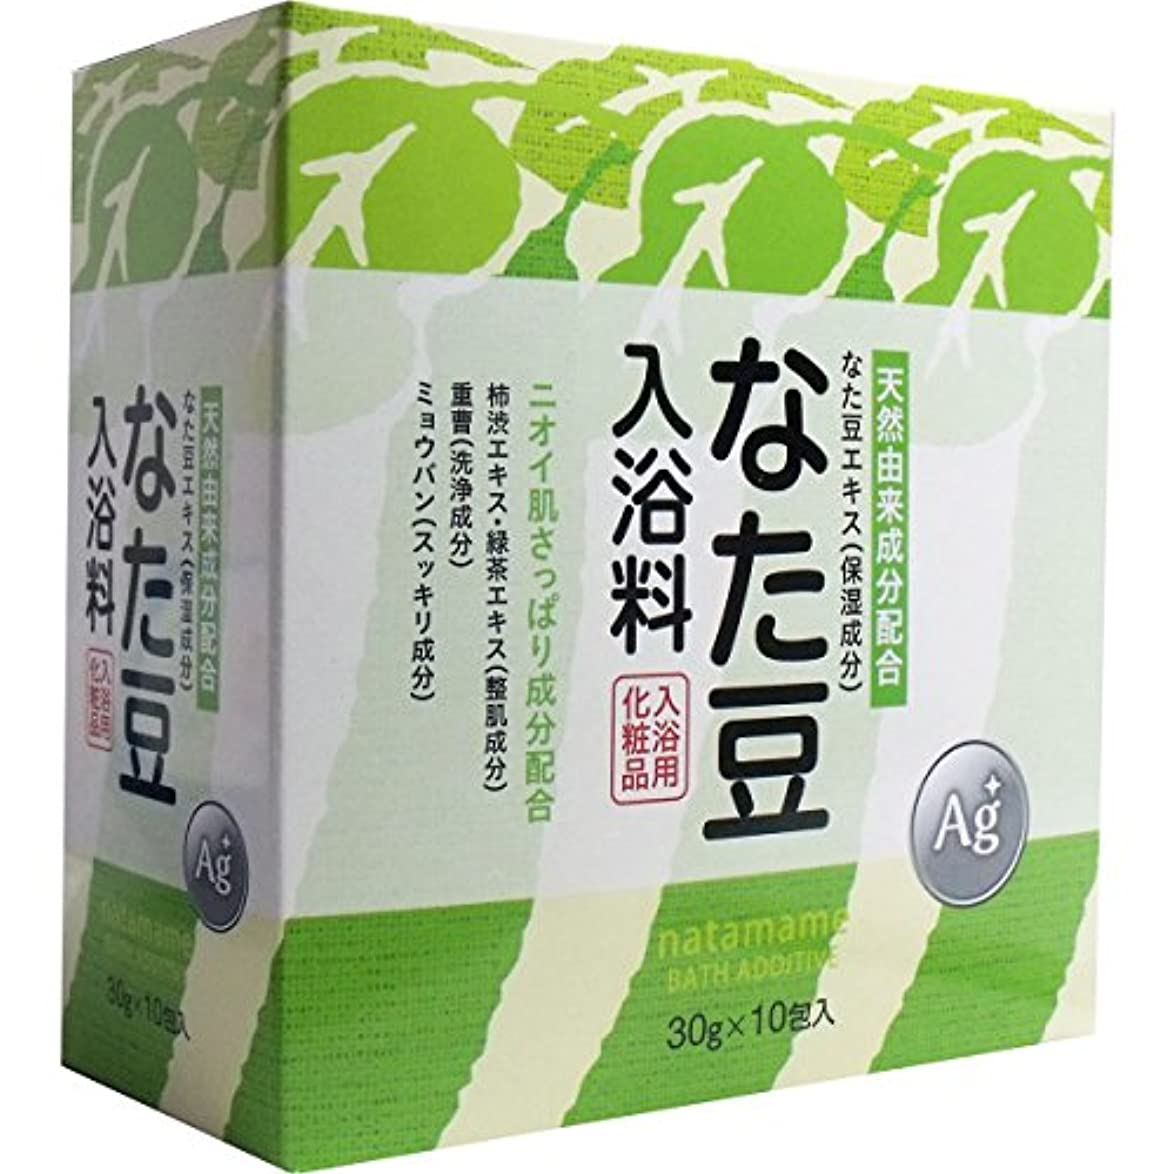 科学者誘発する例外天然由来成分配合 なた豆入浴料 入浴用化粧品 30g×10包入